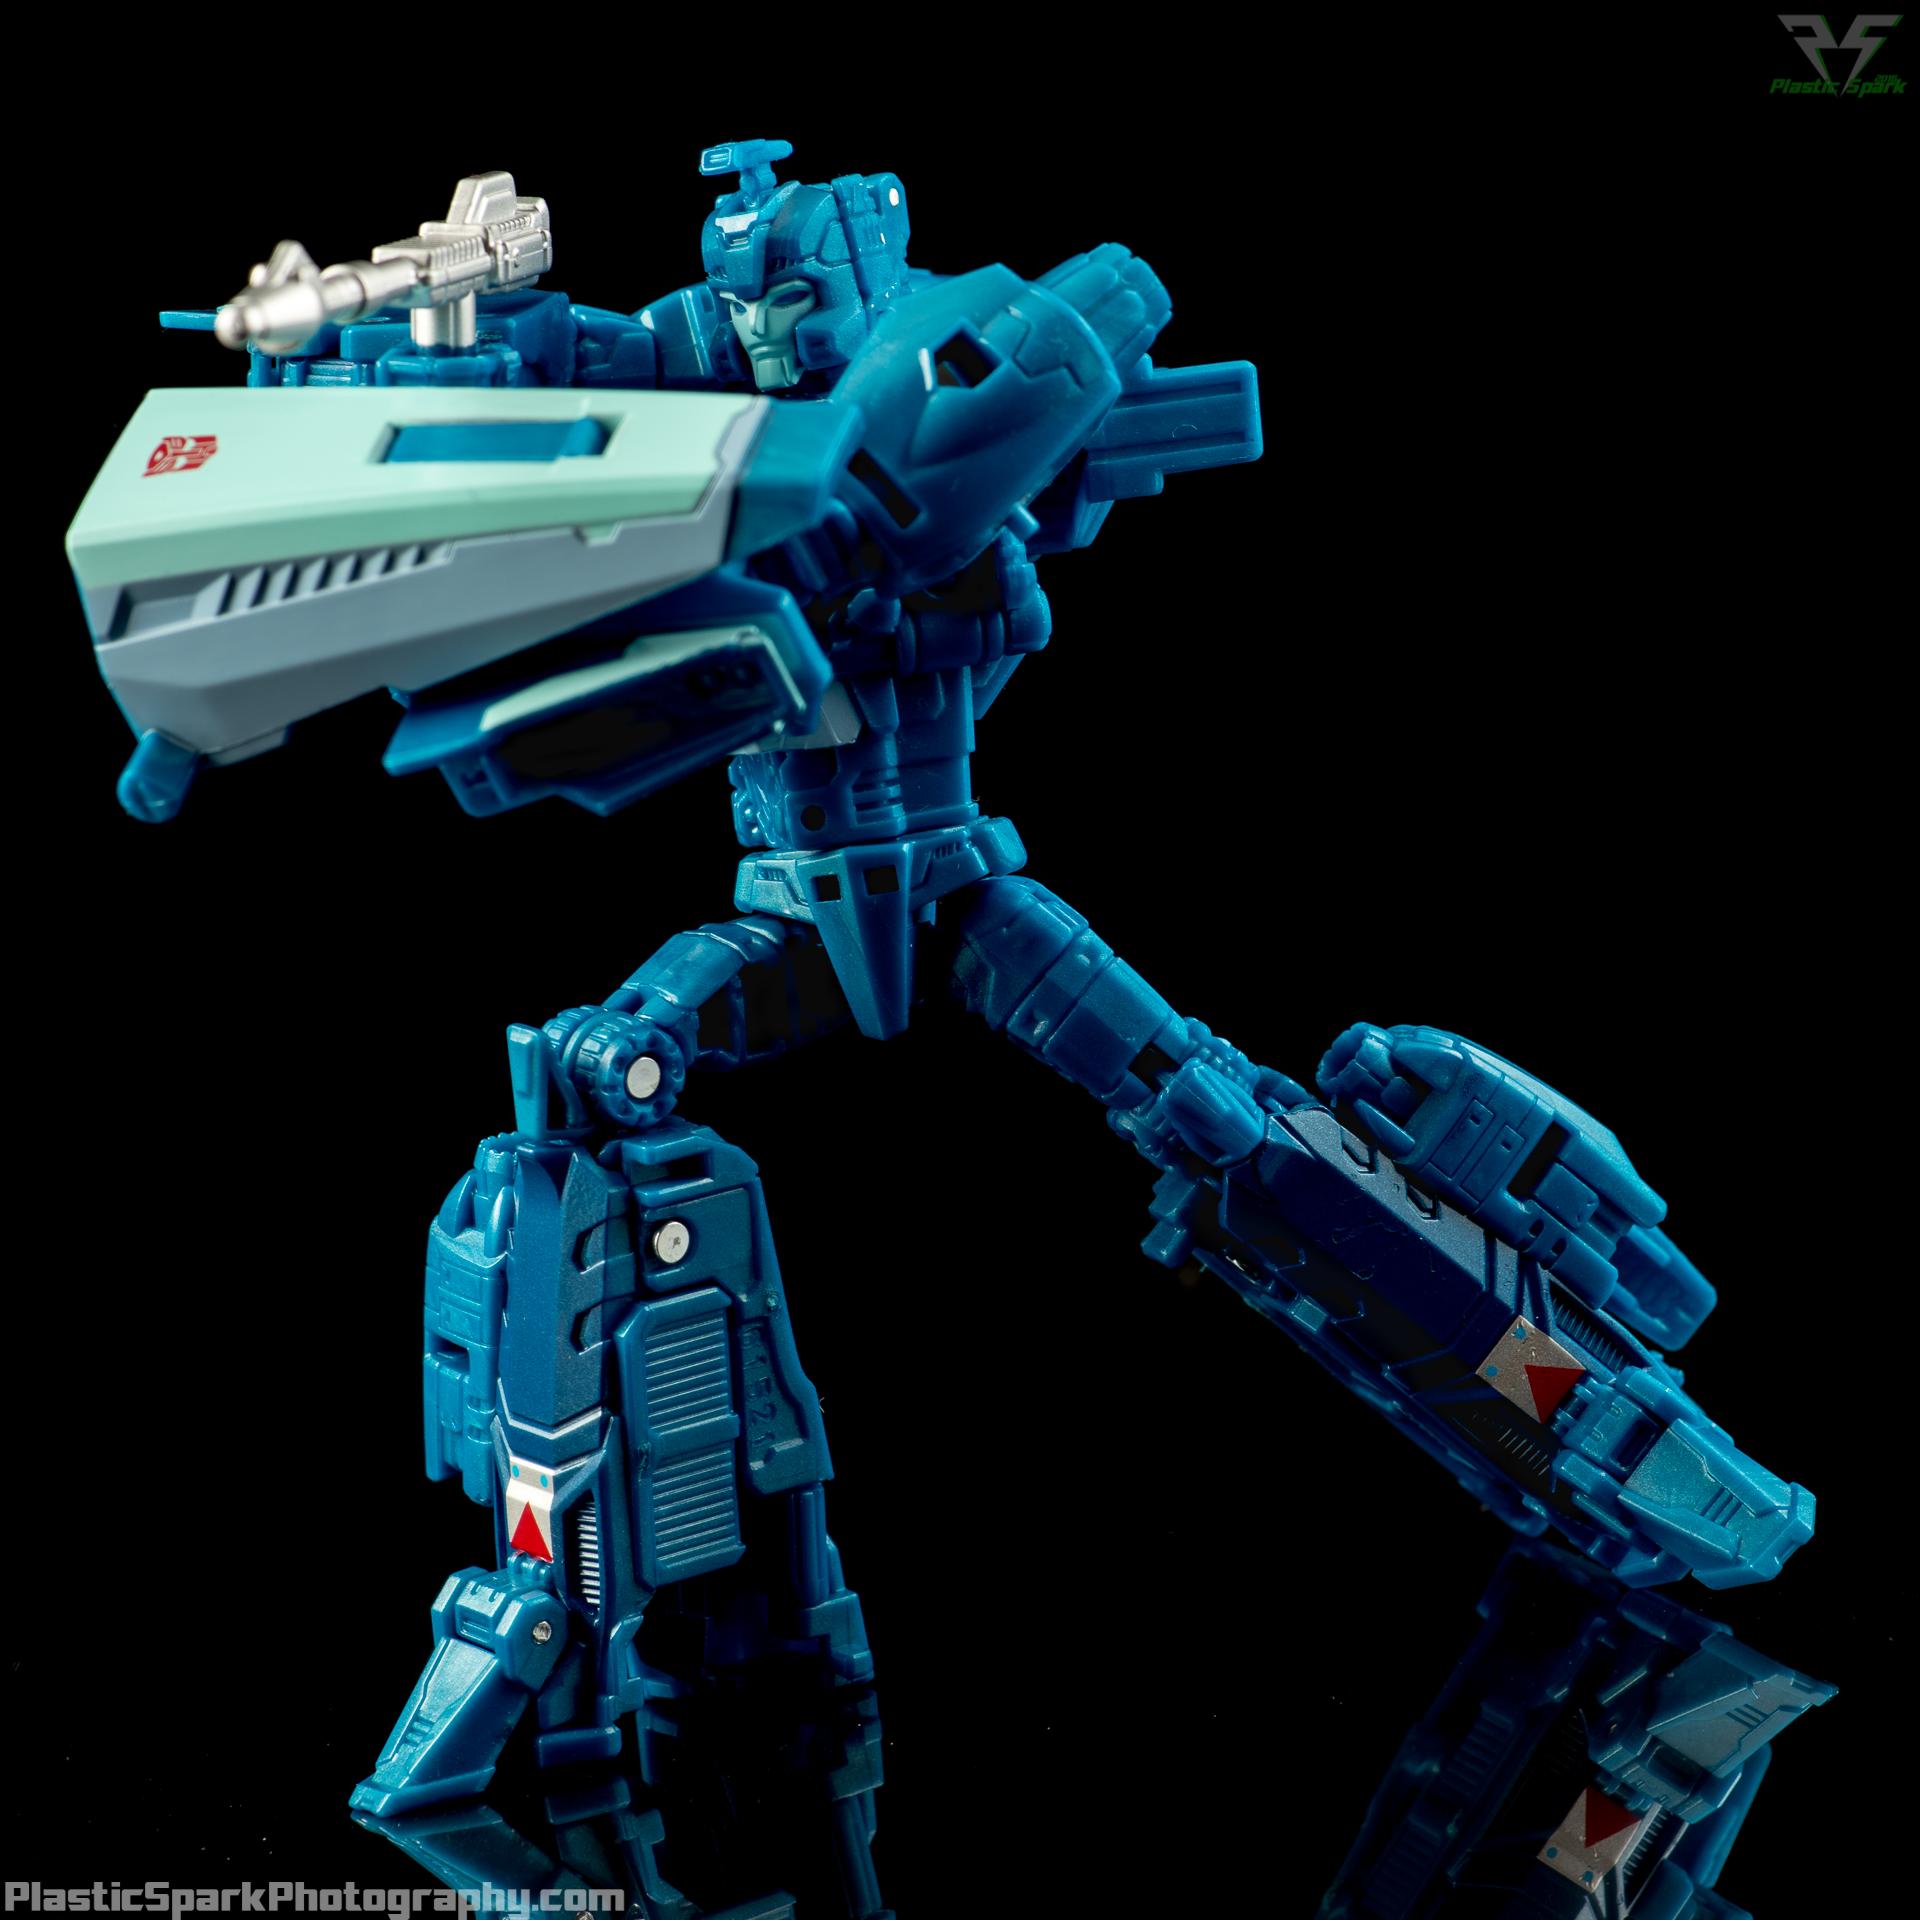 Titans-Return-Blurr-(3-of-6).png